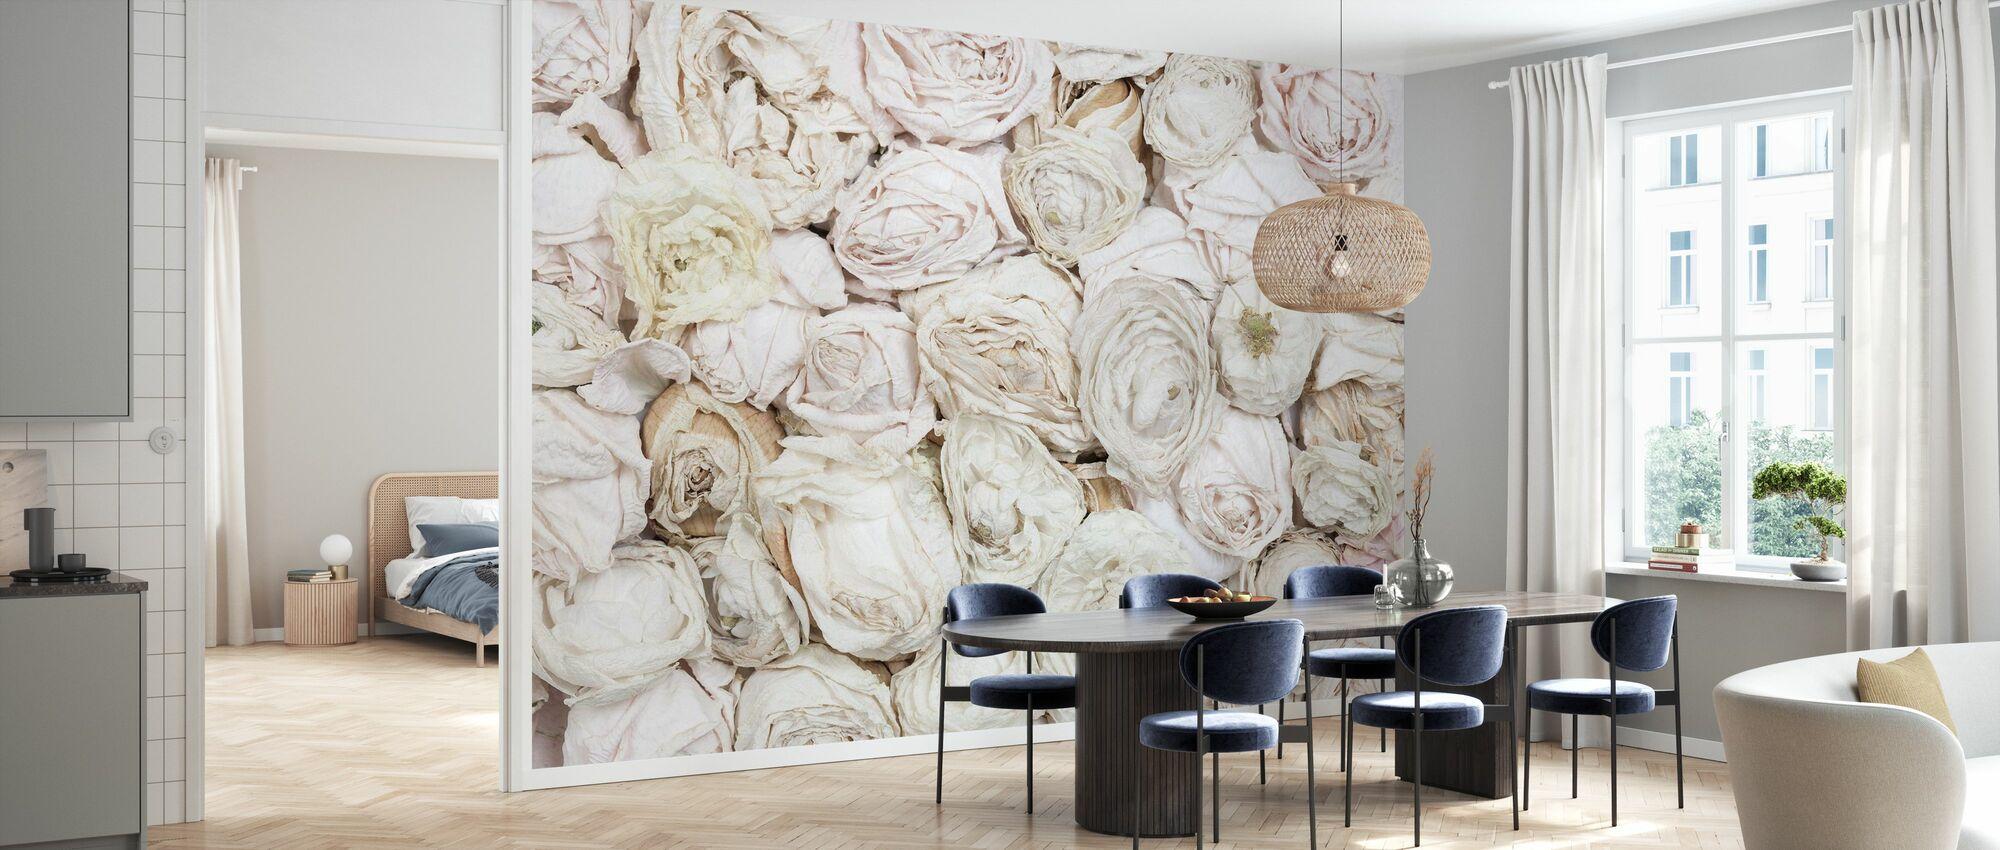 Old White Roses - Wallpaper - Kitchen